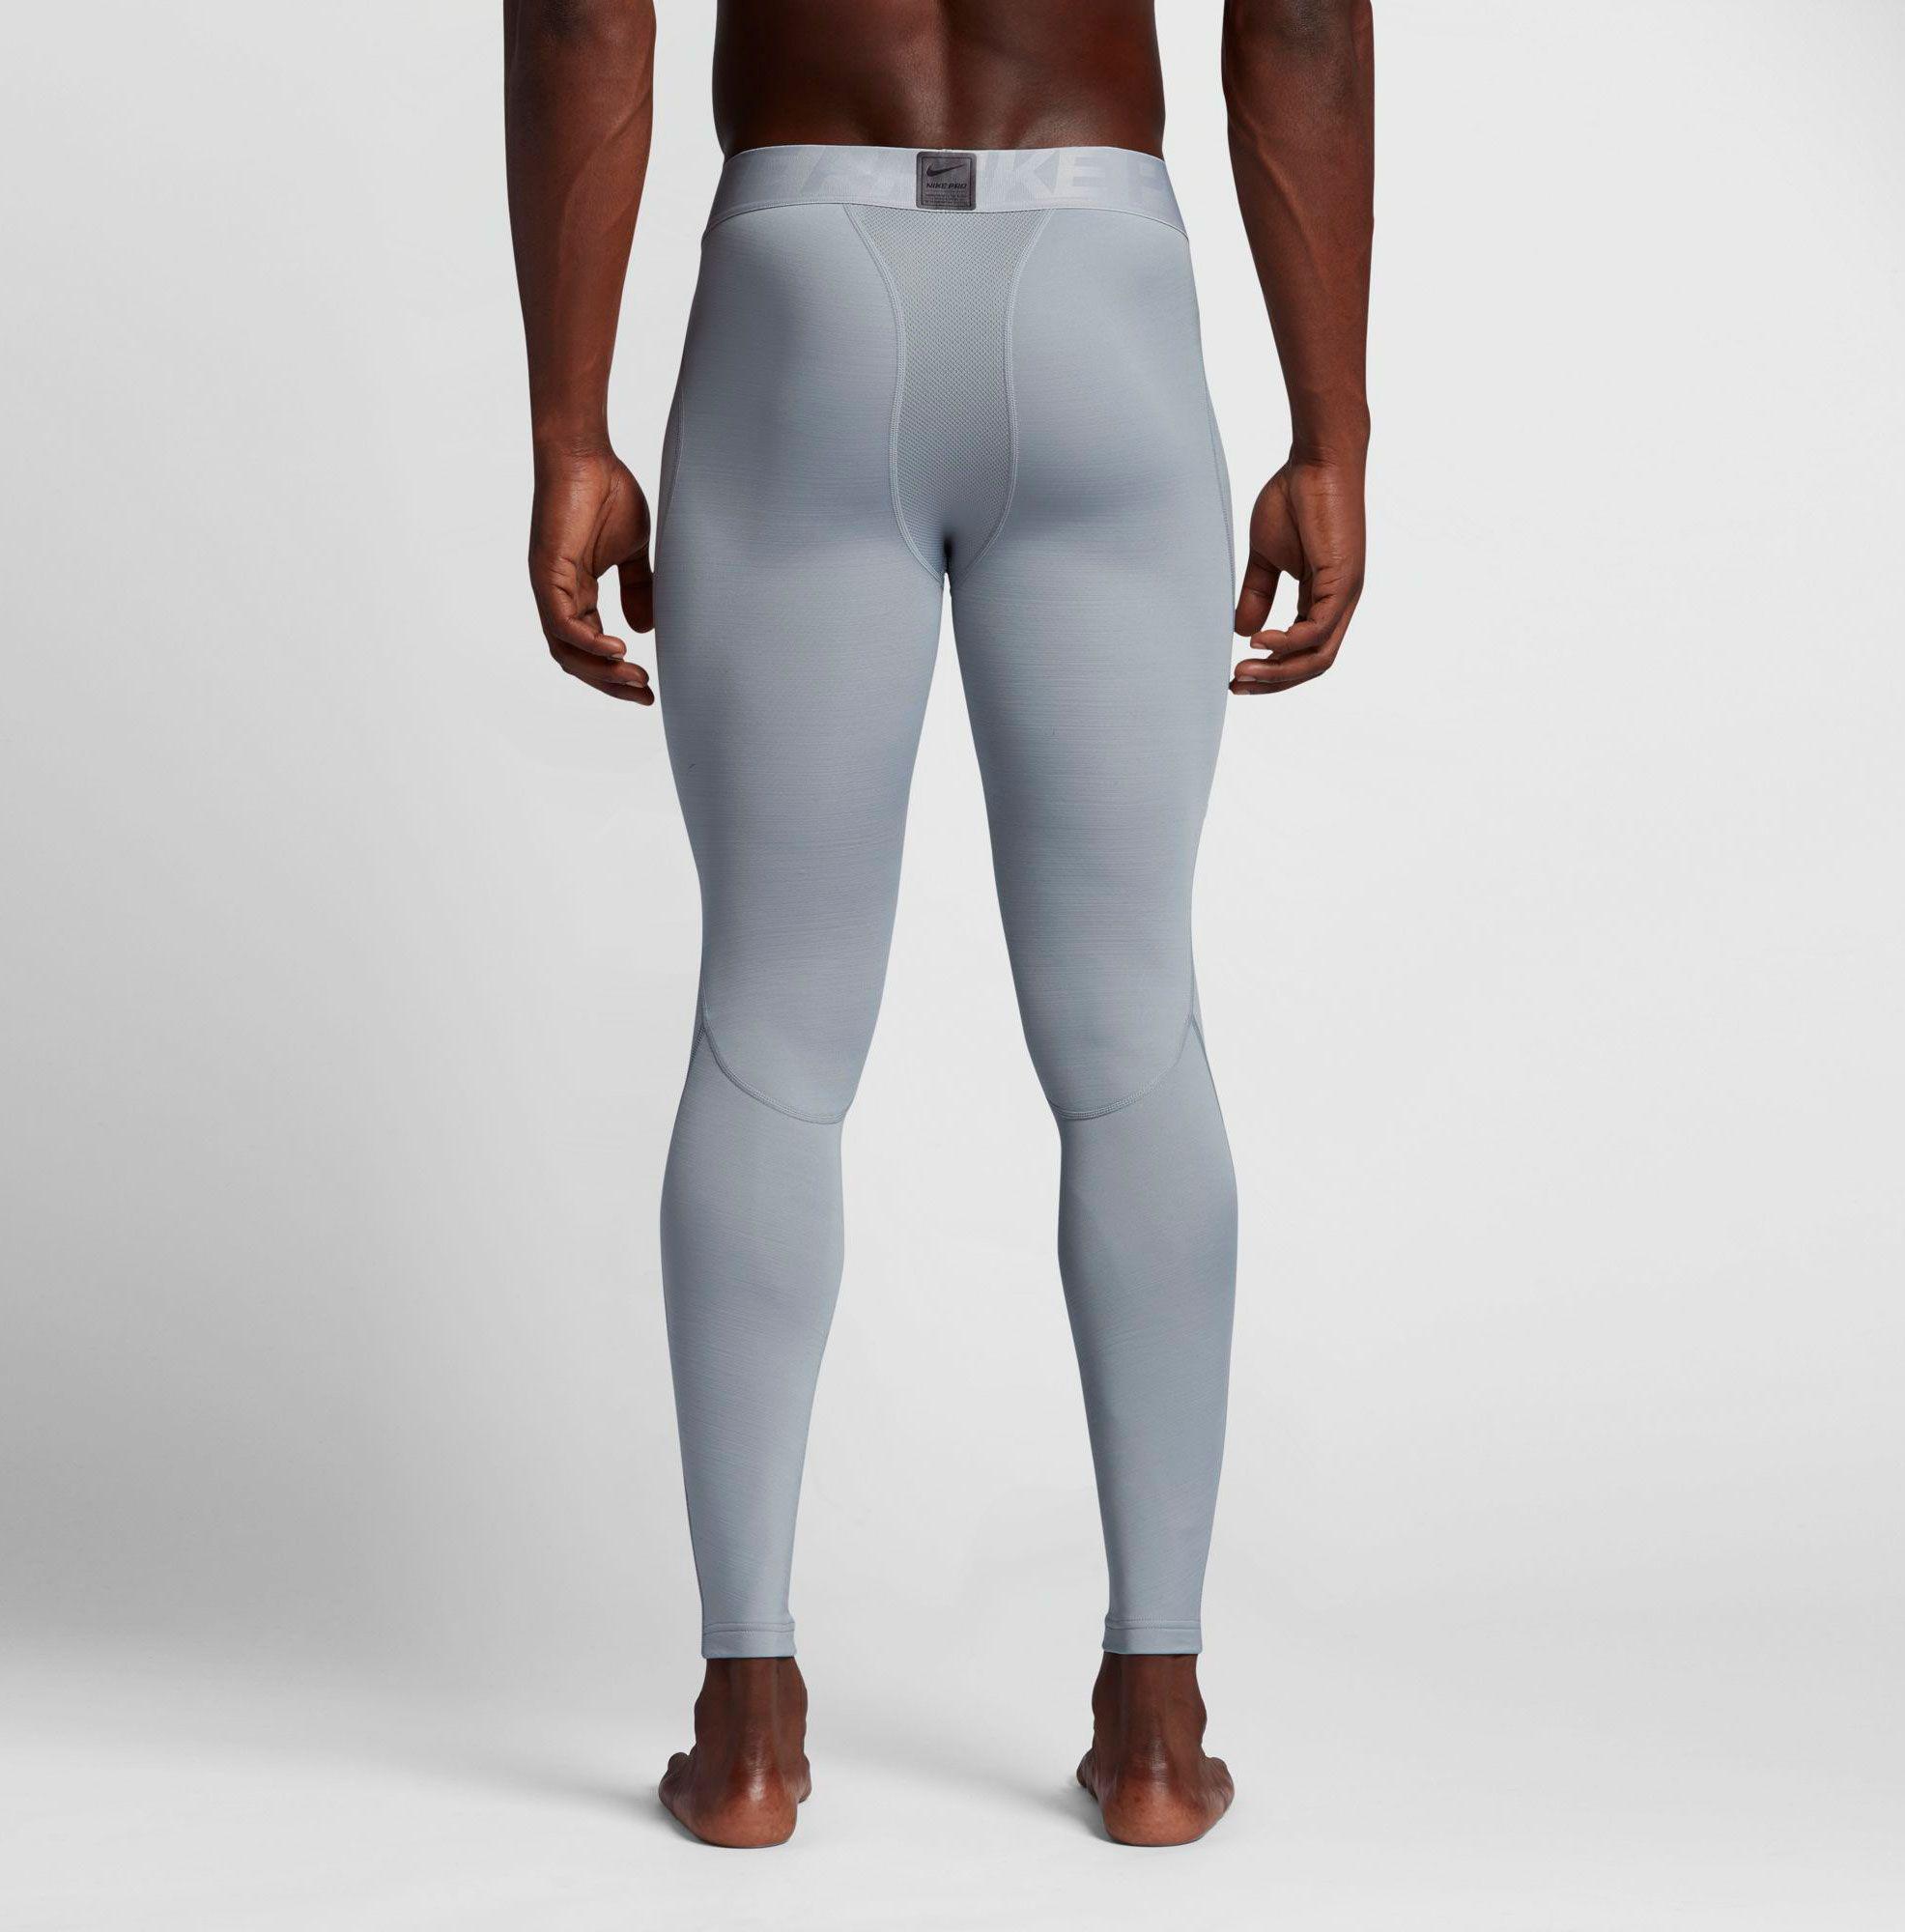 d4e22b13f5023 Nike - Gray Pro Aeroloft Tights for Men - Lyst. View fullscreen